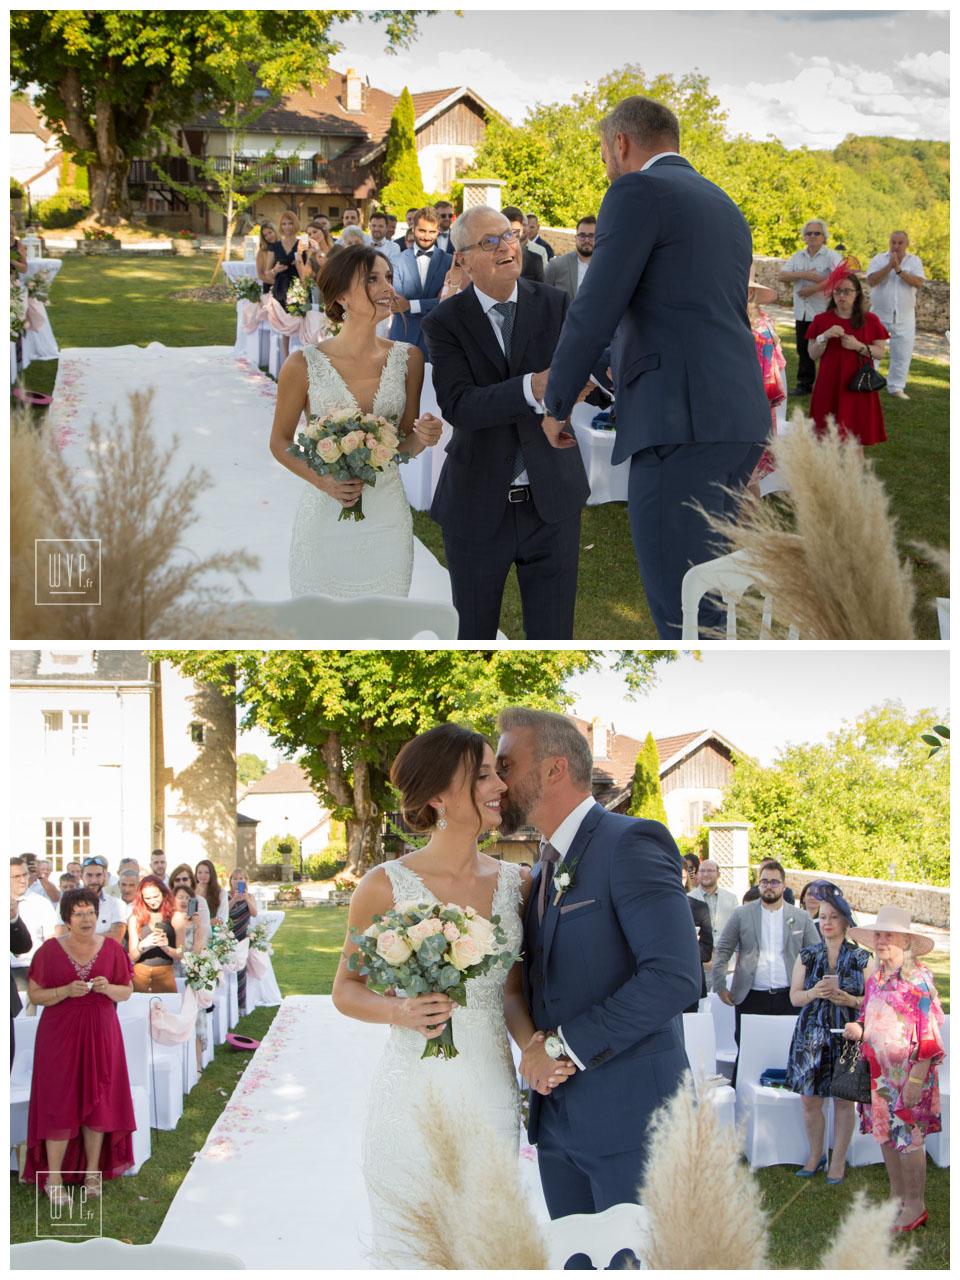 Mariage Marie-Alix et Xavier Marie-Alix and Xavier wedding